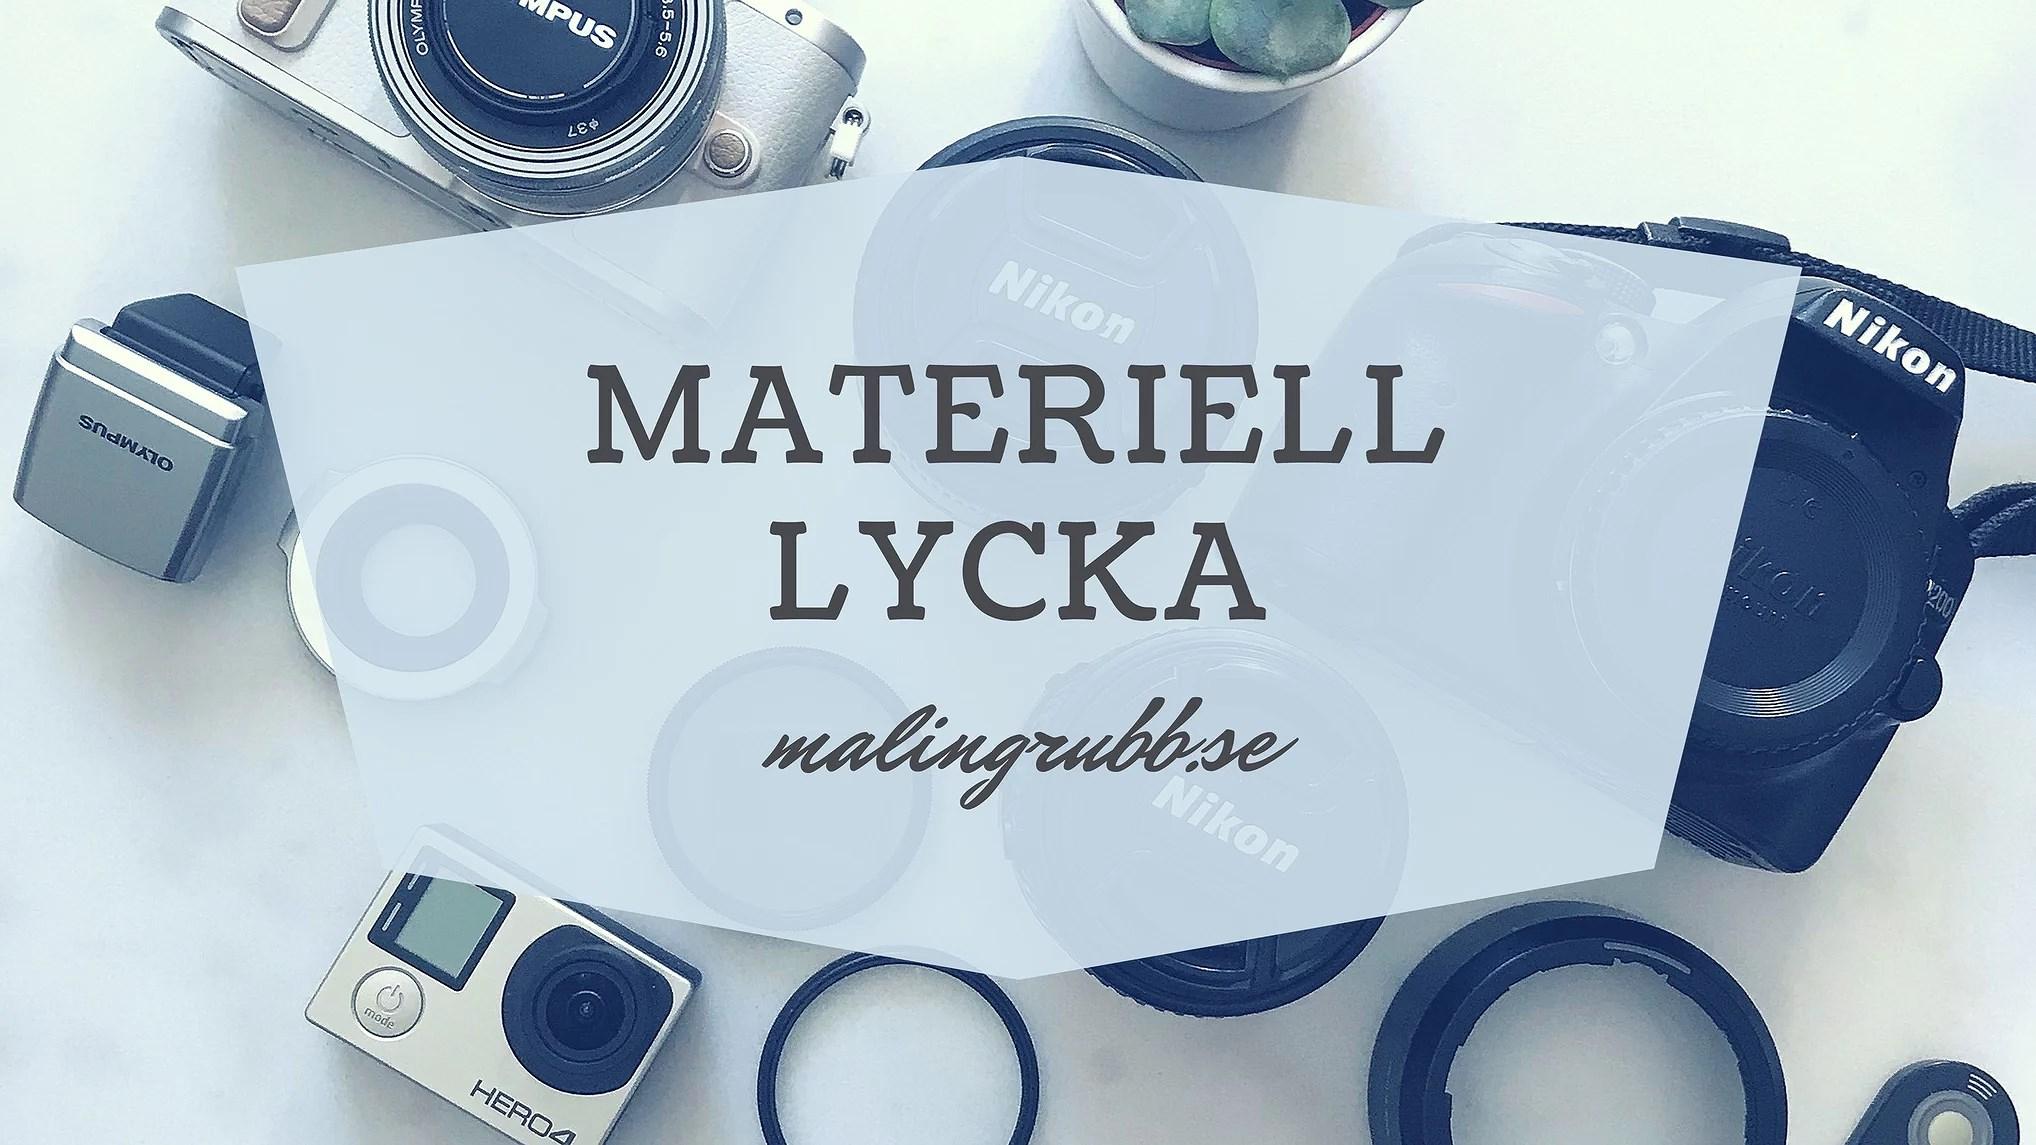 Materiell lycka